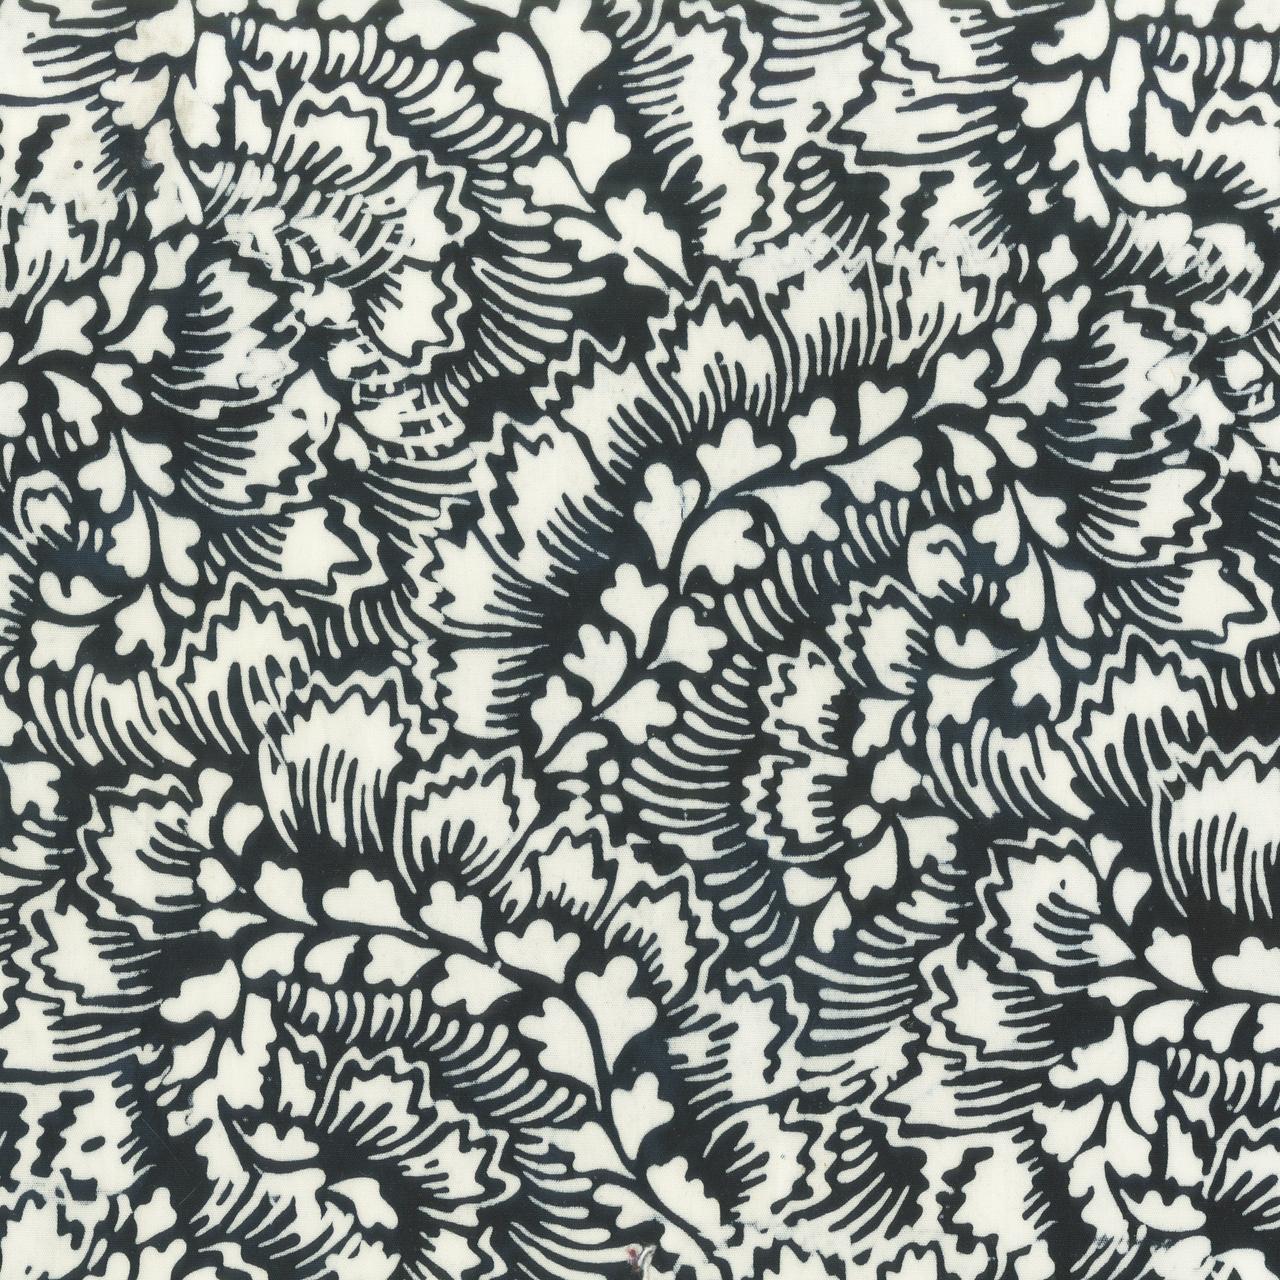 Batik b&w- Feathered